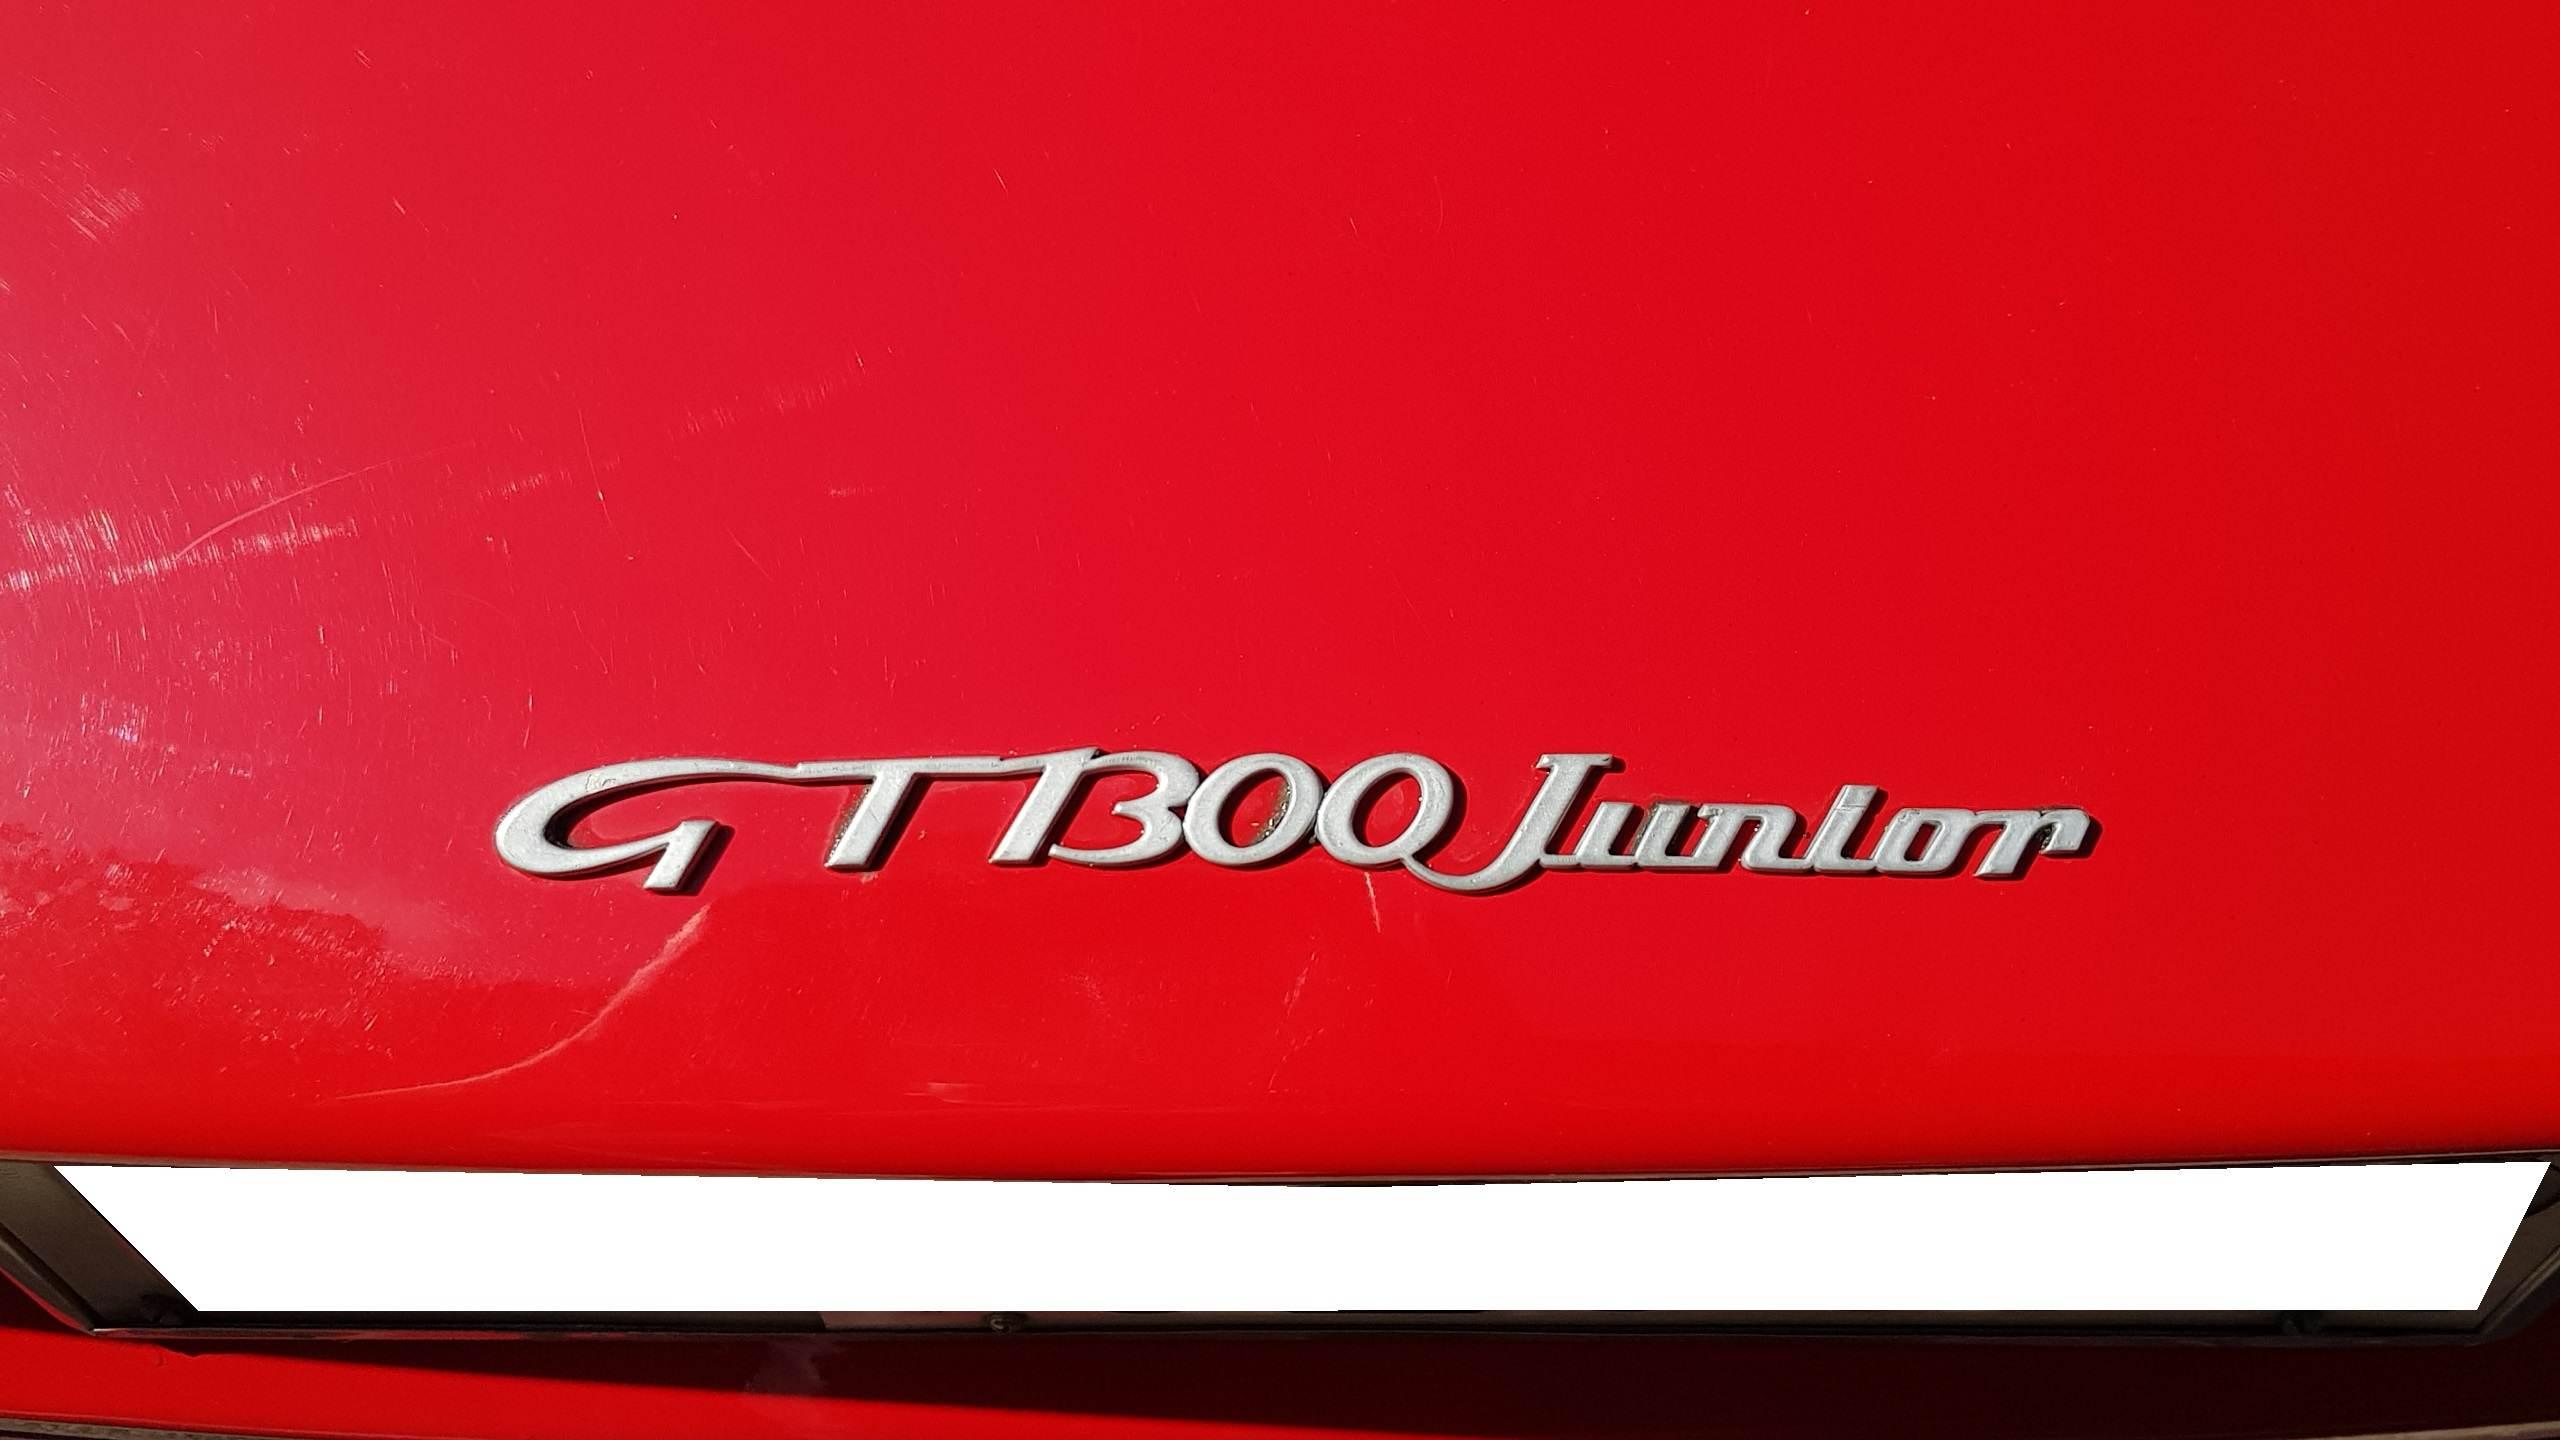 foto GT Junior 1300 scalino (1968) - 7